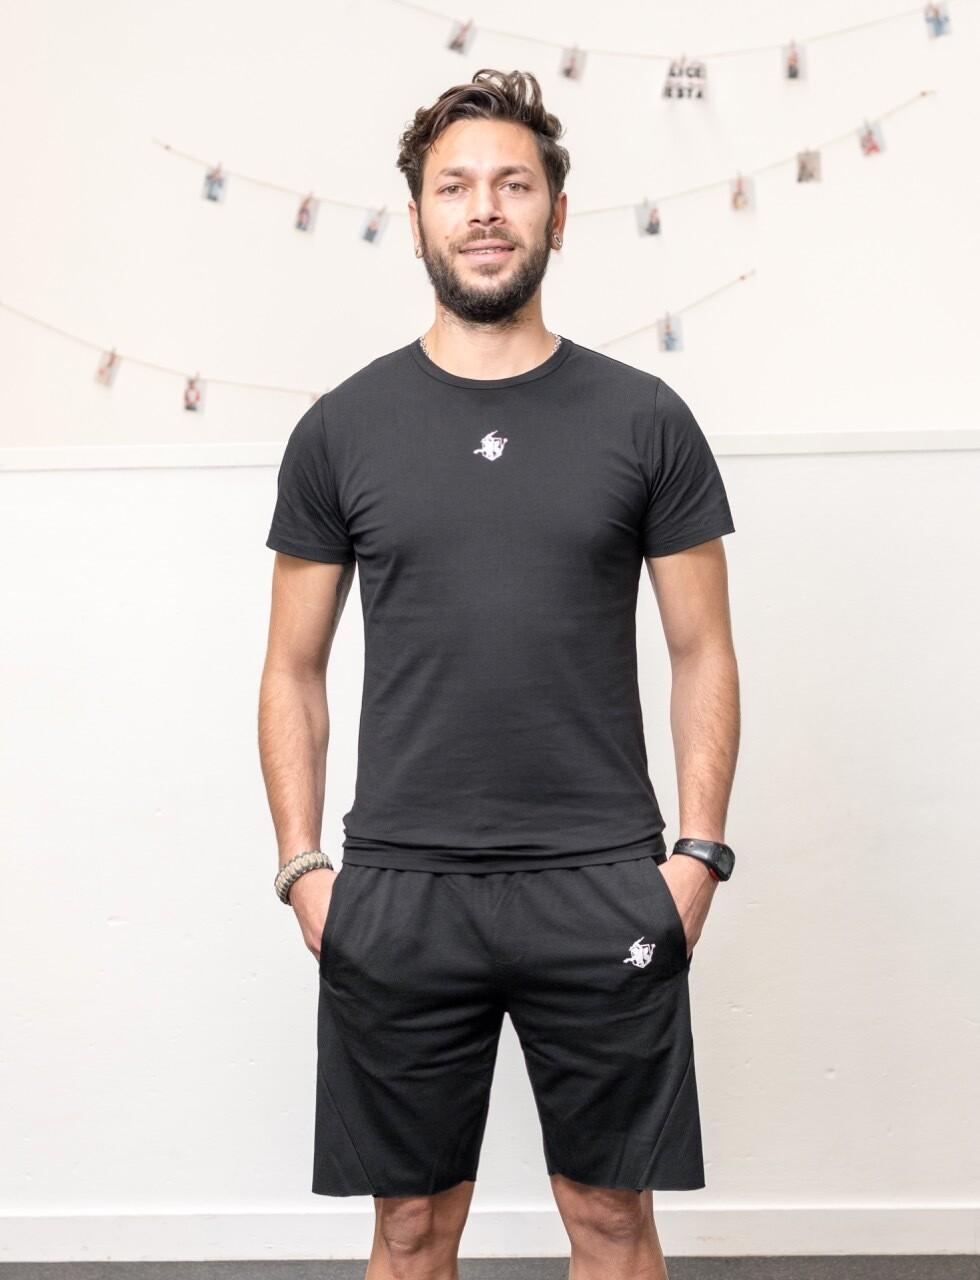 ARGOS T-shirt   Black